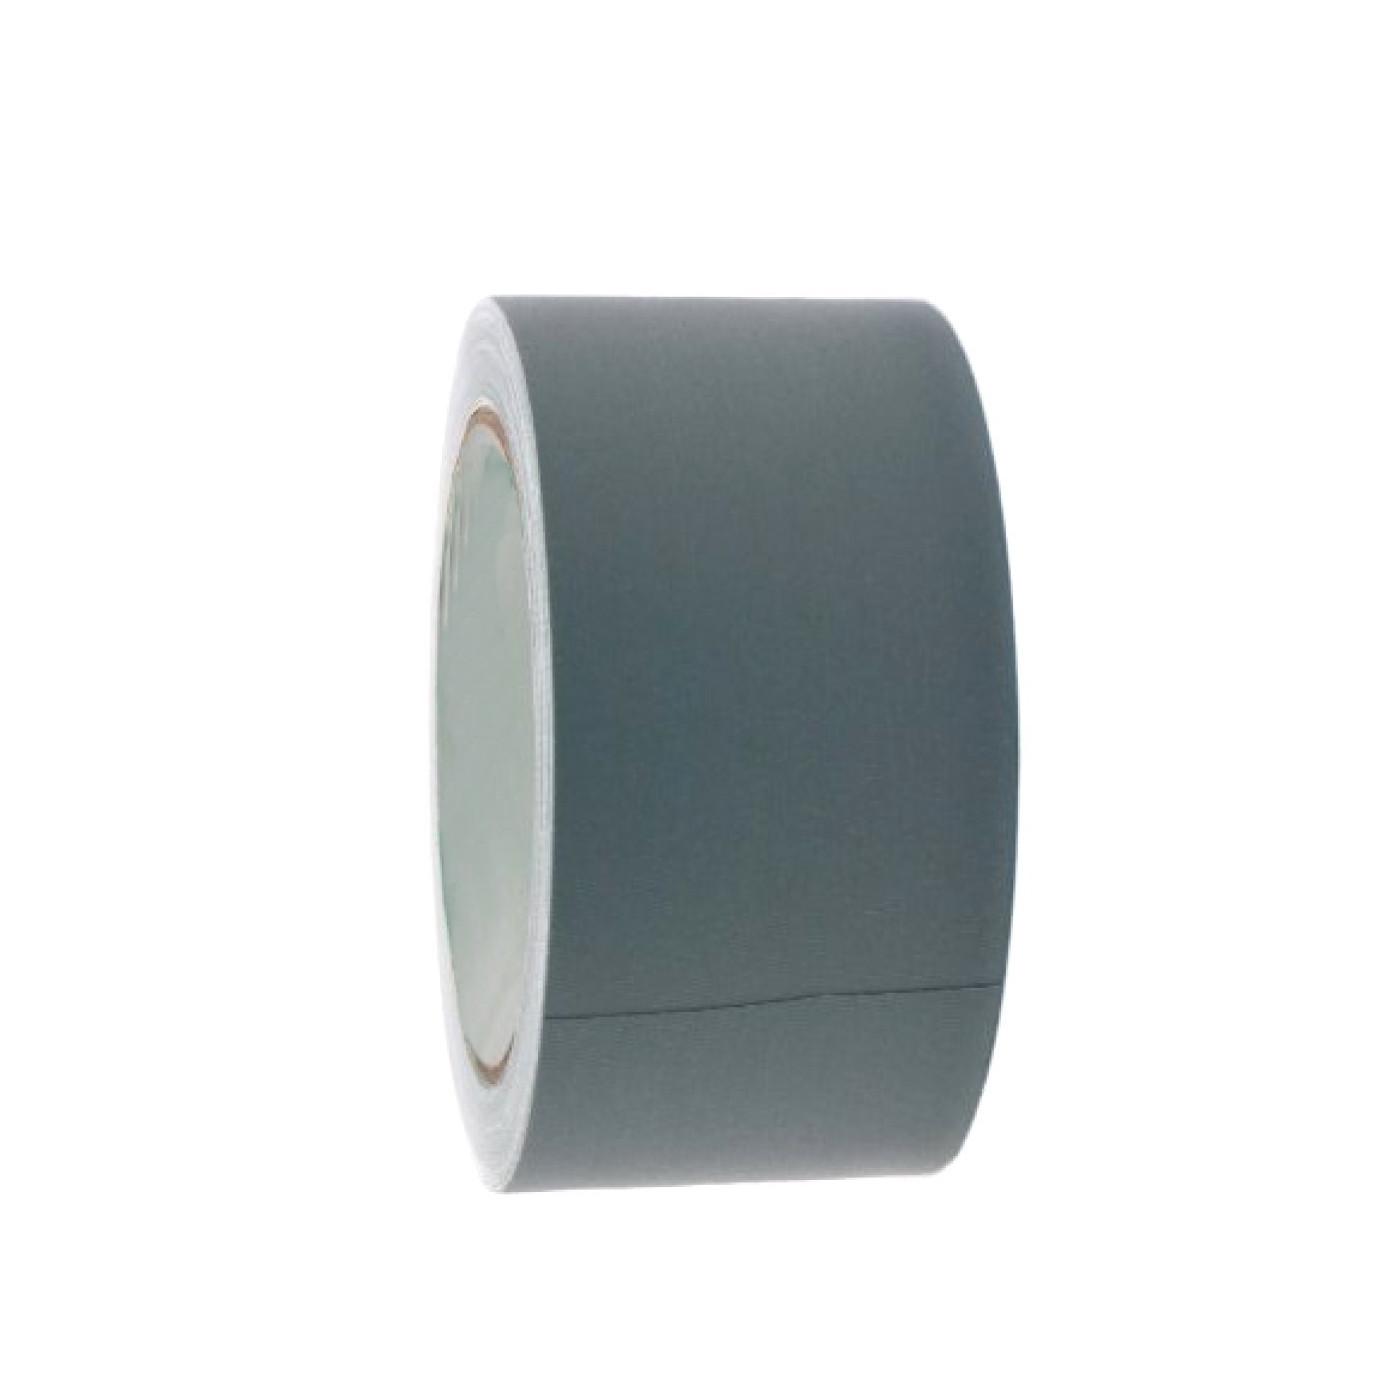 Set of 5 rolls of repair tape (duct tape), 5 cm wide  - 1